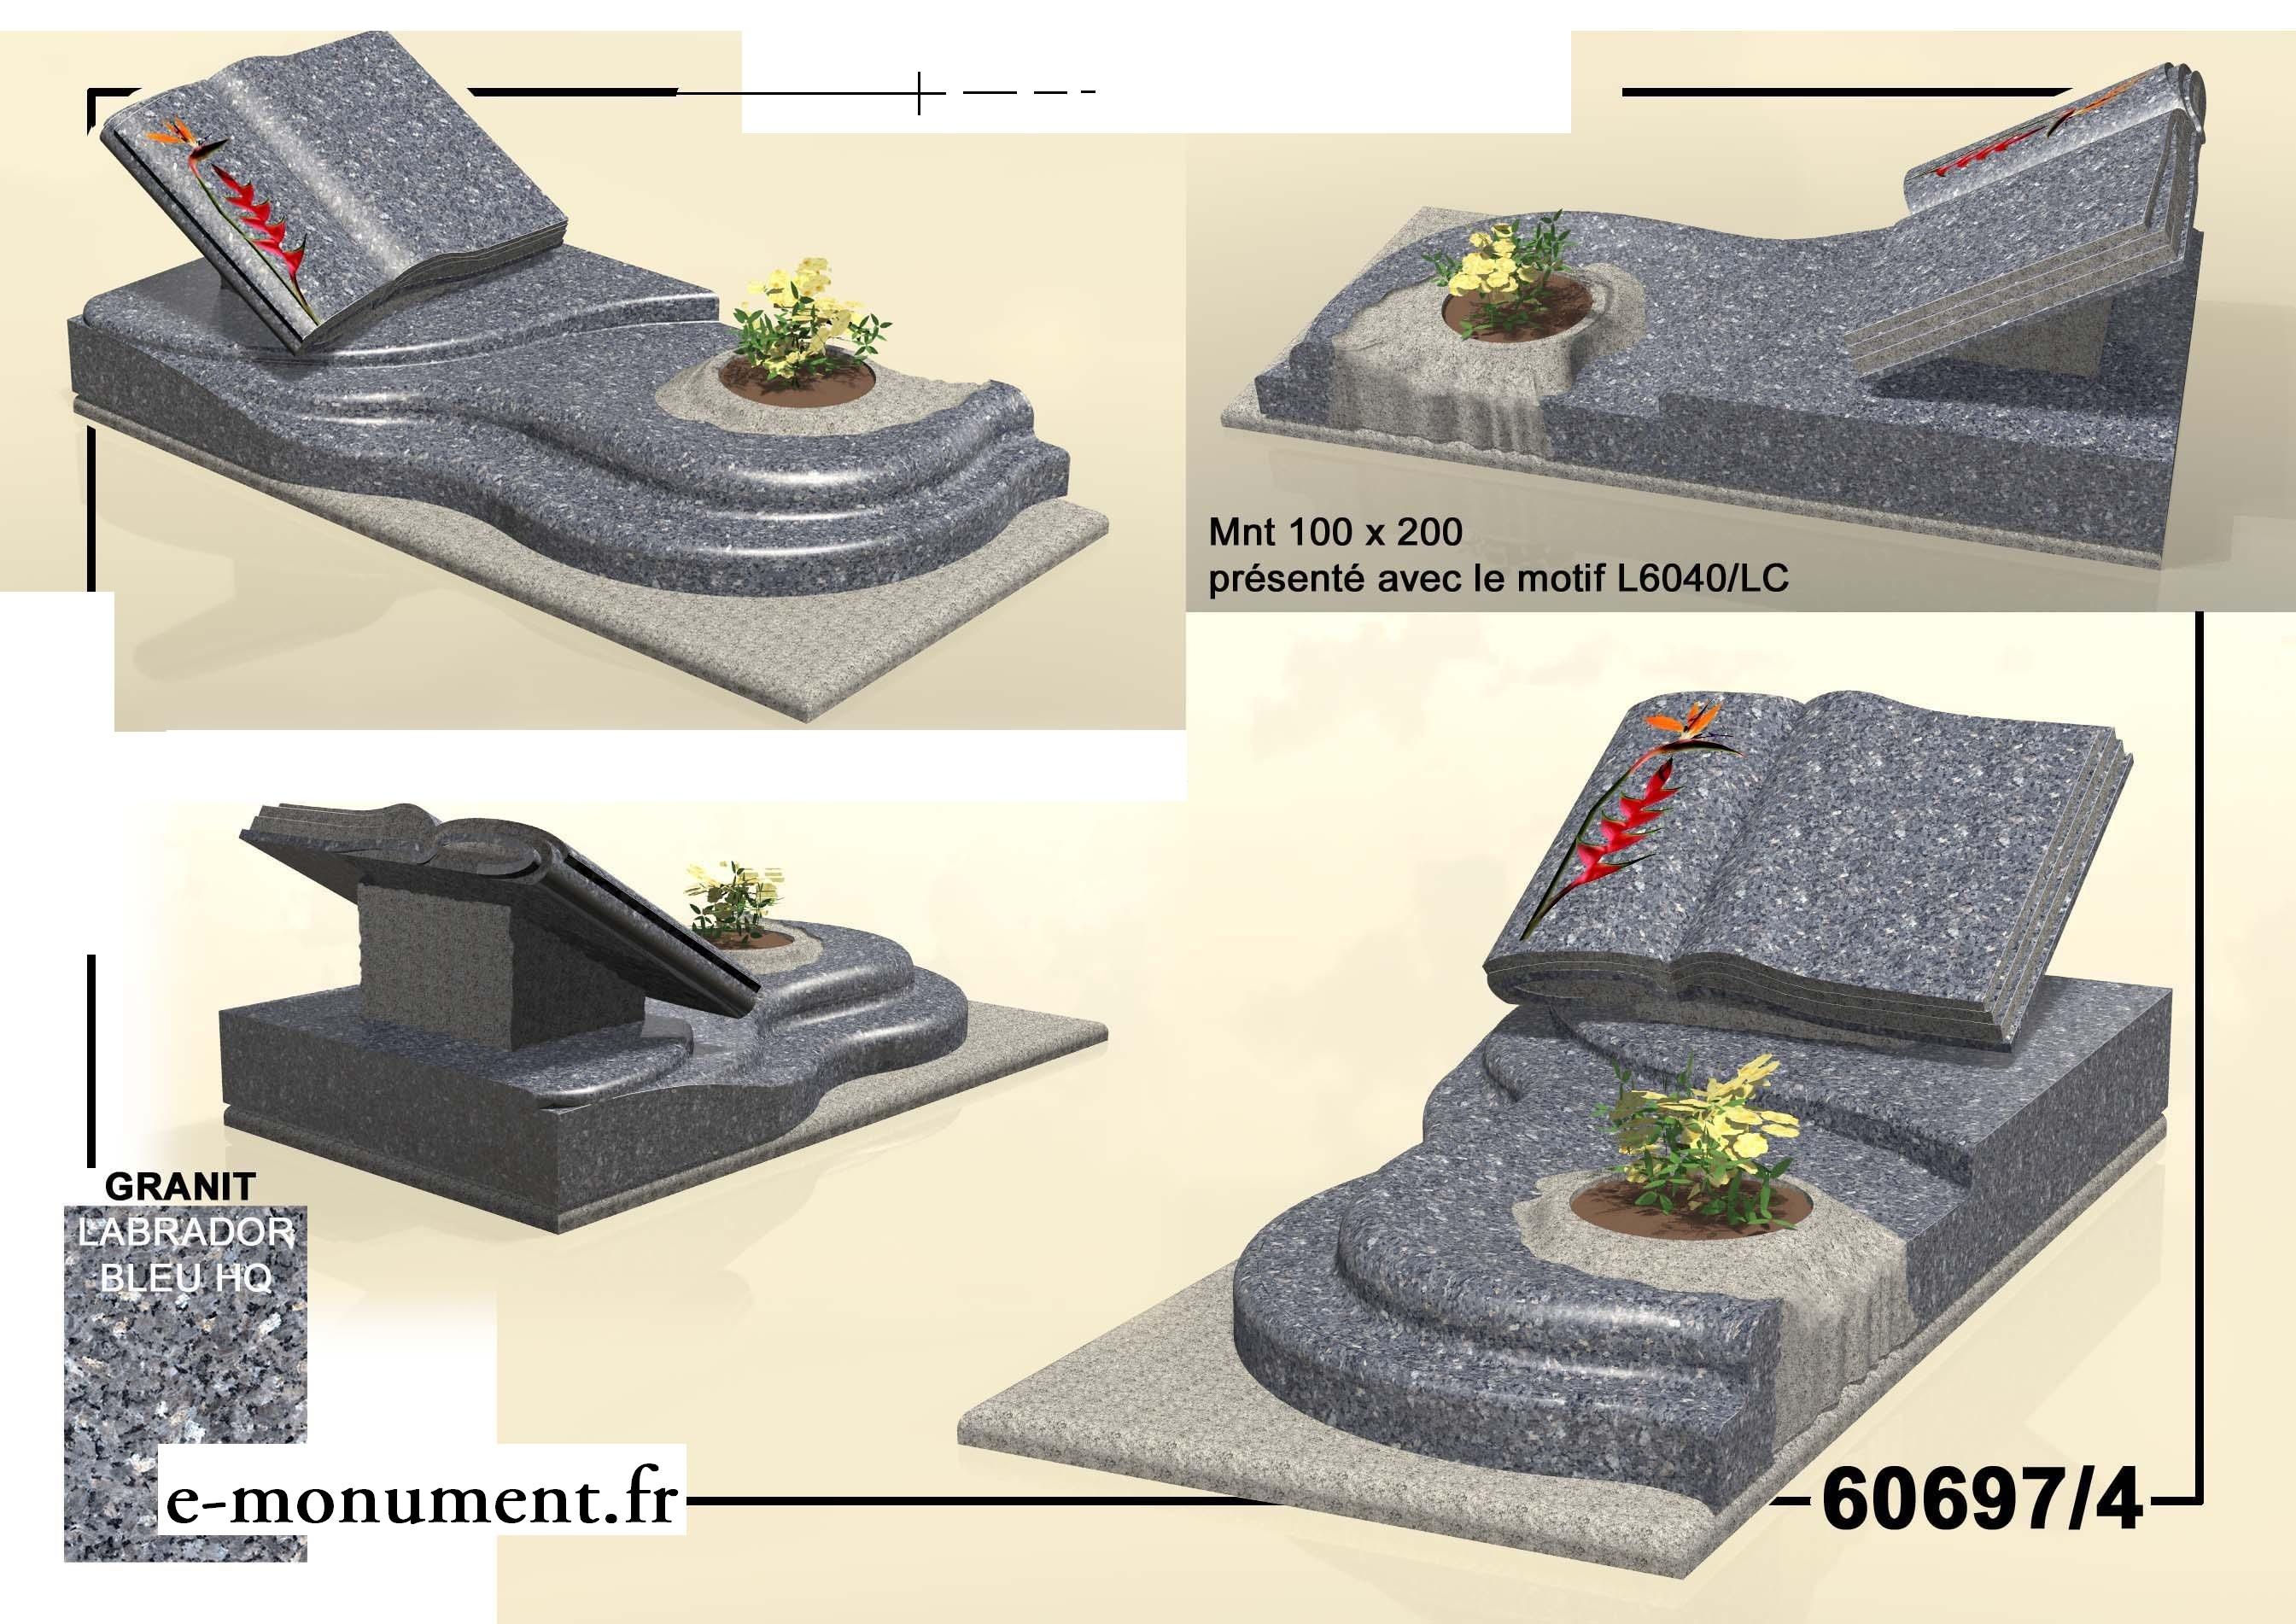 un chantillon de diff rentes pierres tombales cr er. Black Bedroom Furniture Sets. Home Design Ideas